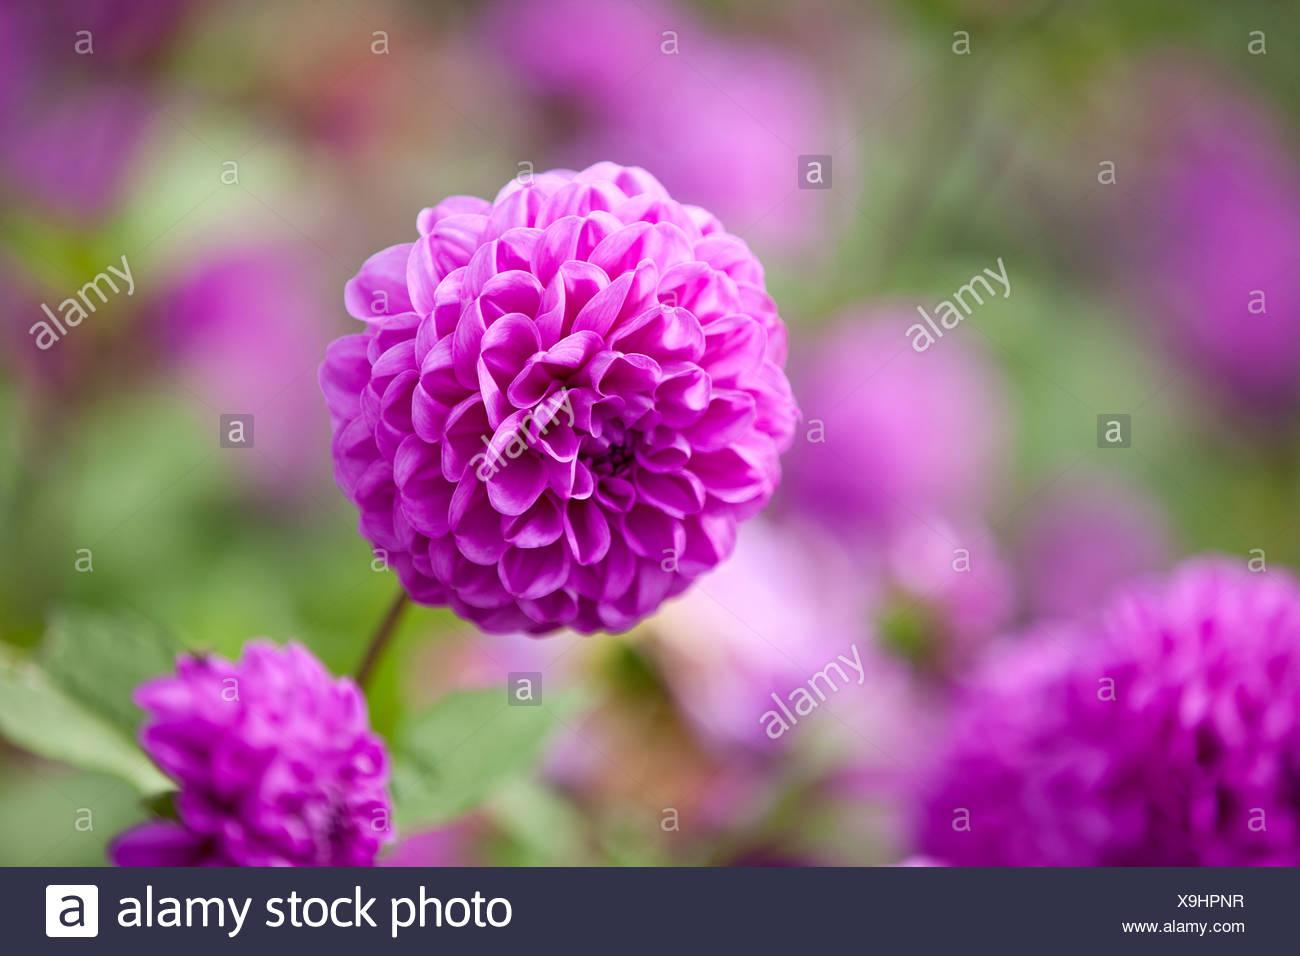 Purple dahlia flowers in bloom stock photo 281288835 alamy purple dahlia flowers in bloom izmirmasajfo